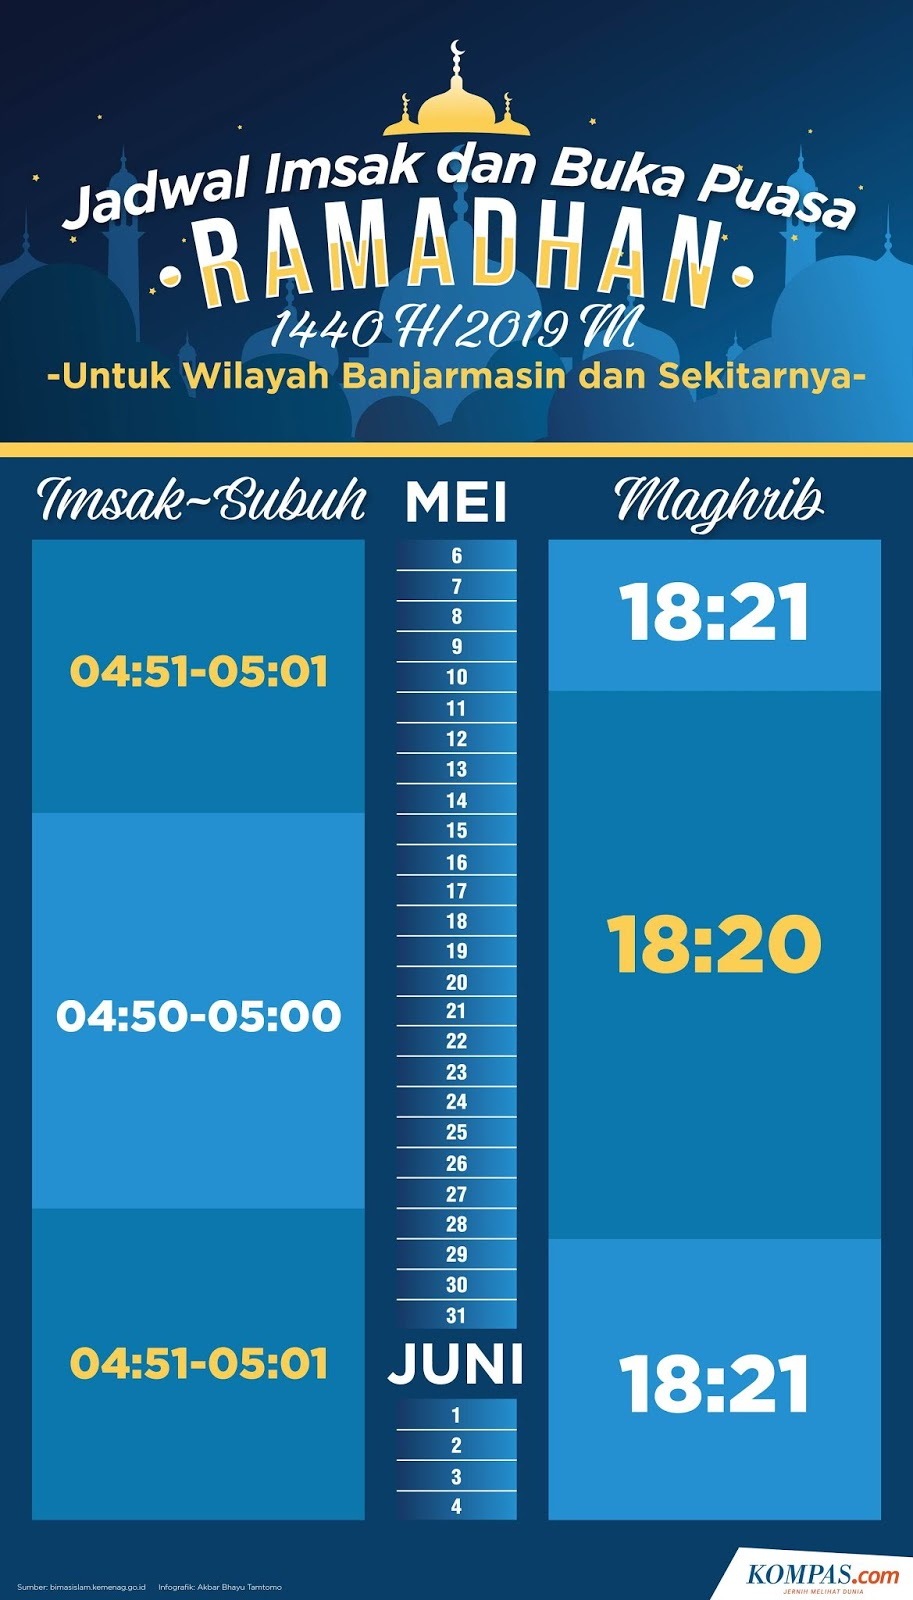 Inilah Jadwal Imsak dan Buka Puasa di Banjarmasin Selama Ramadhan 1440 H